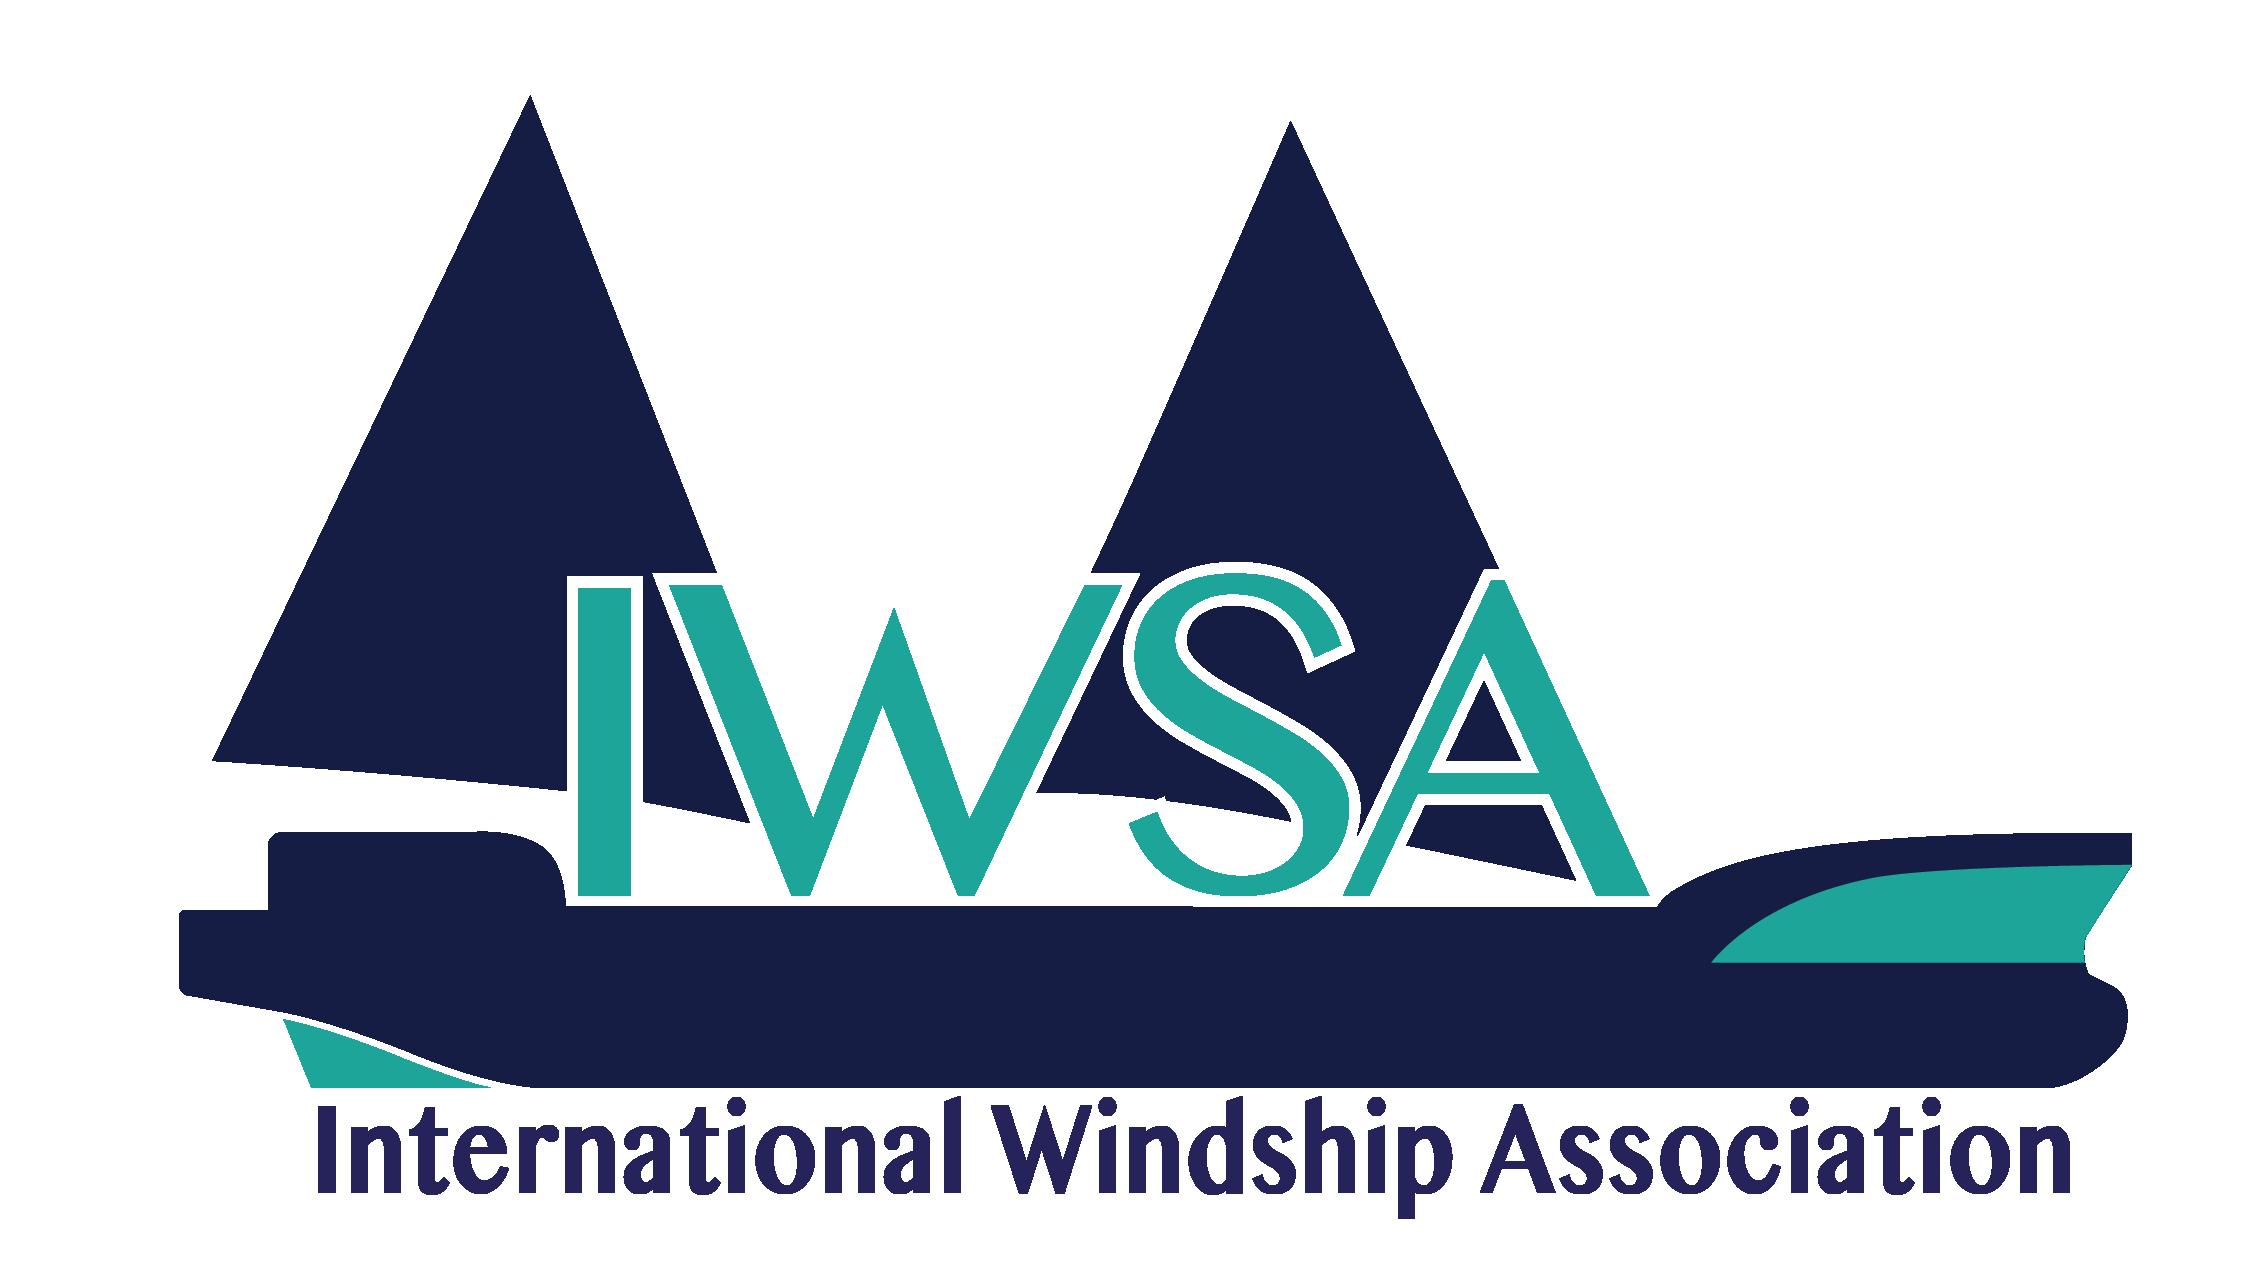 IWSA-logo